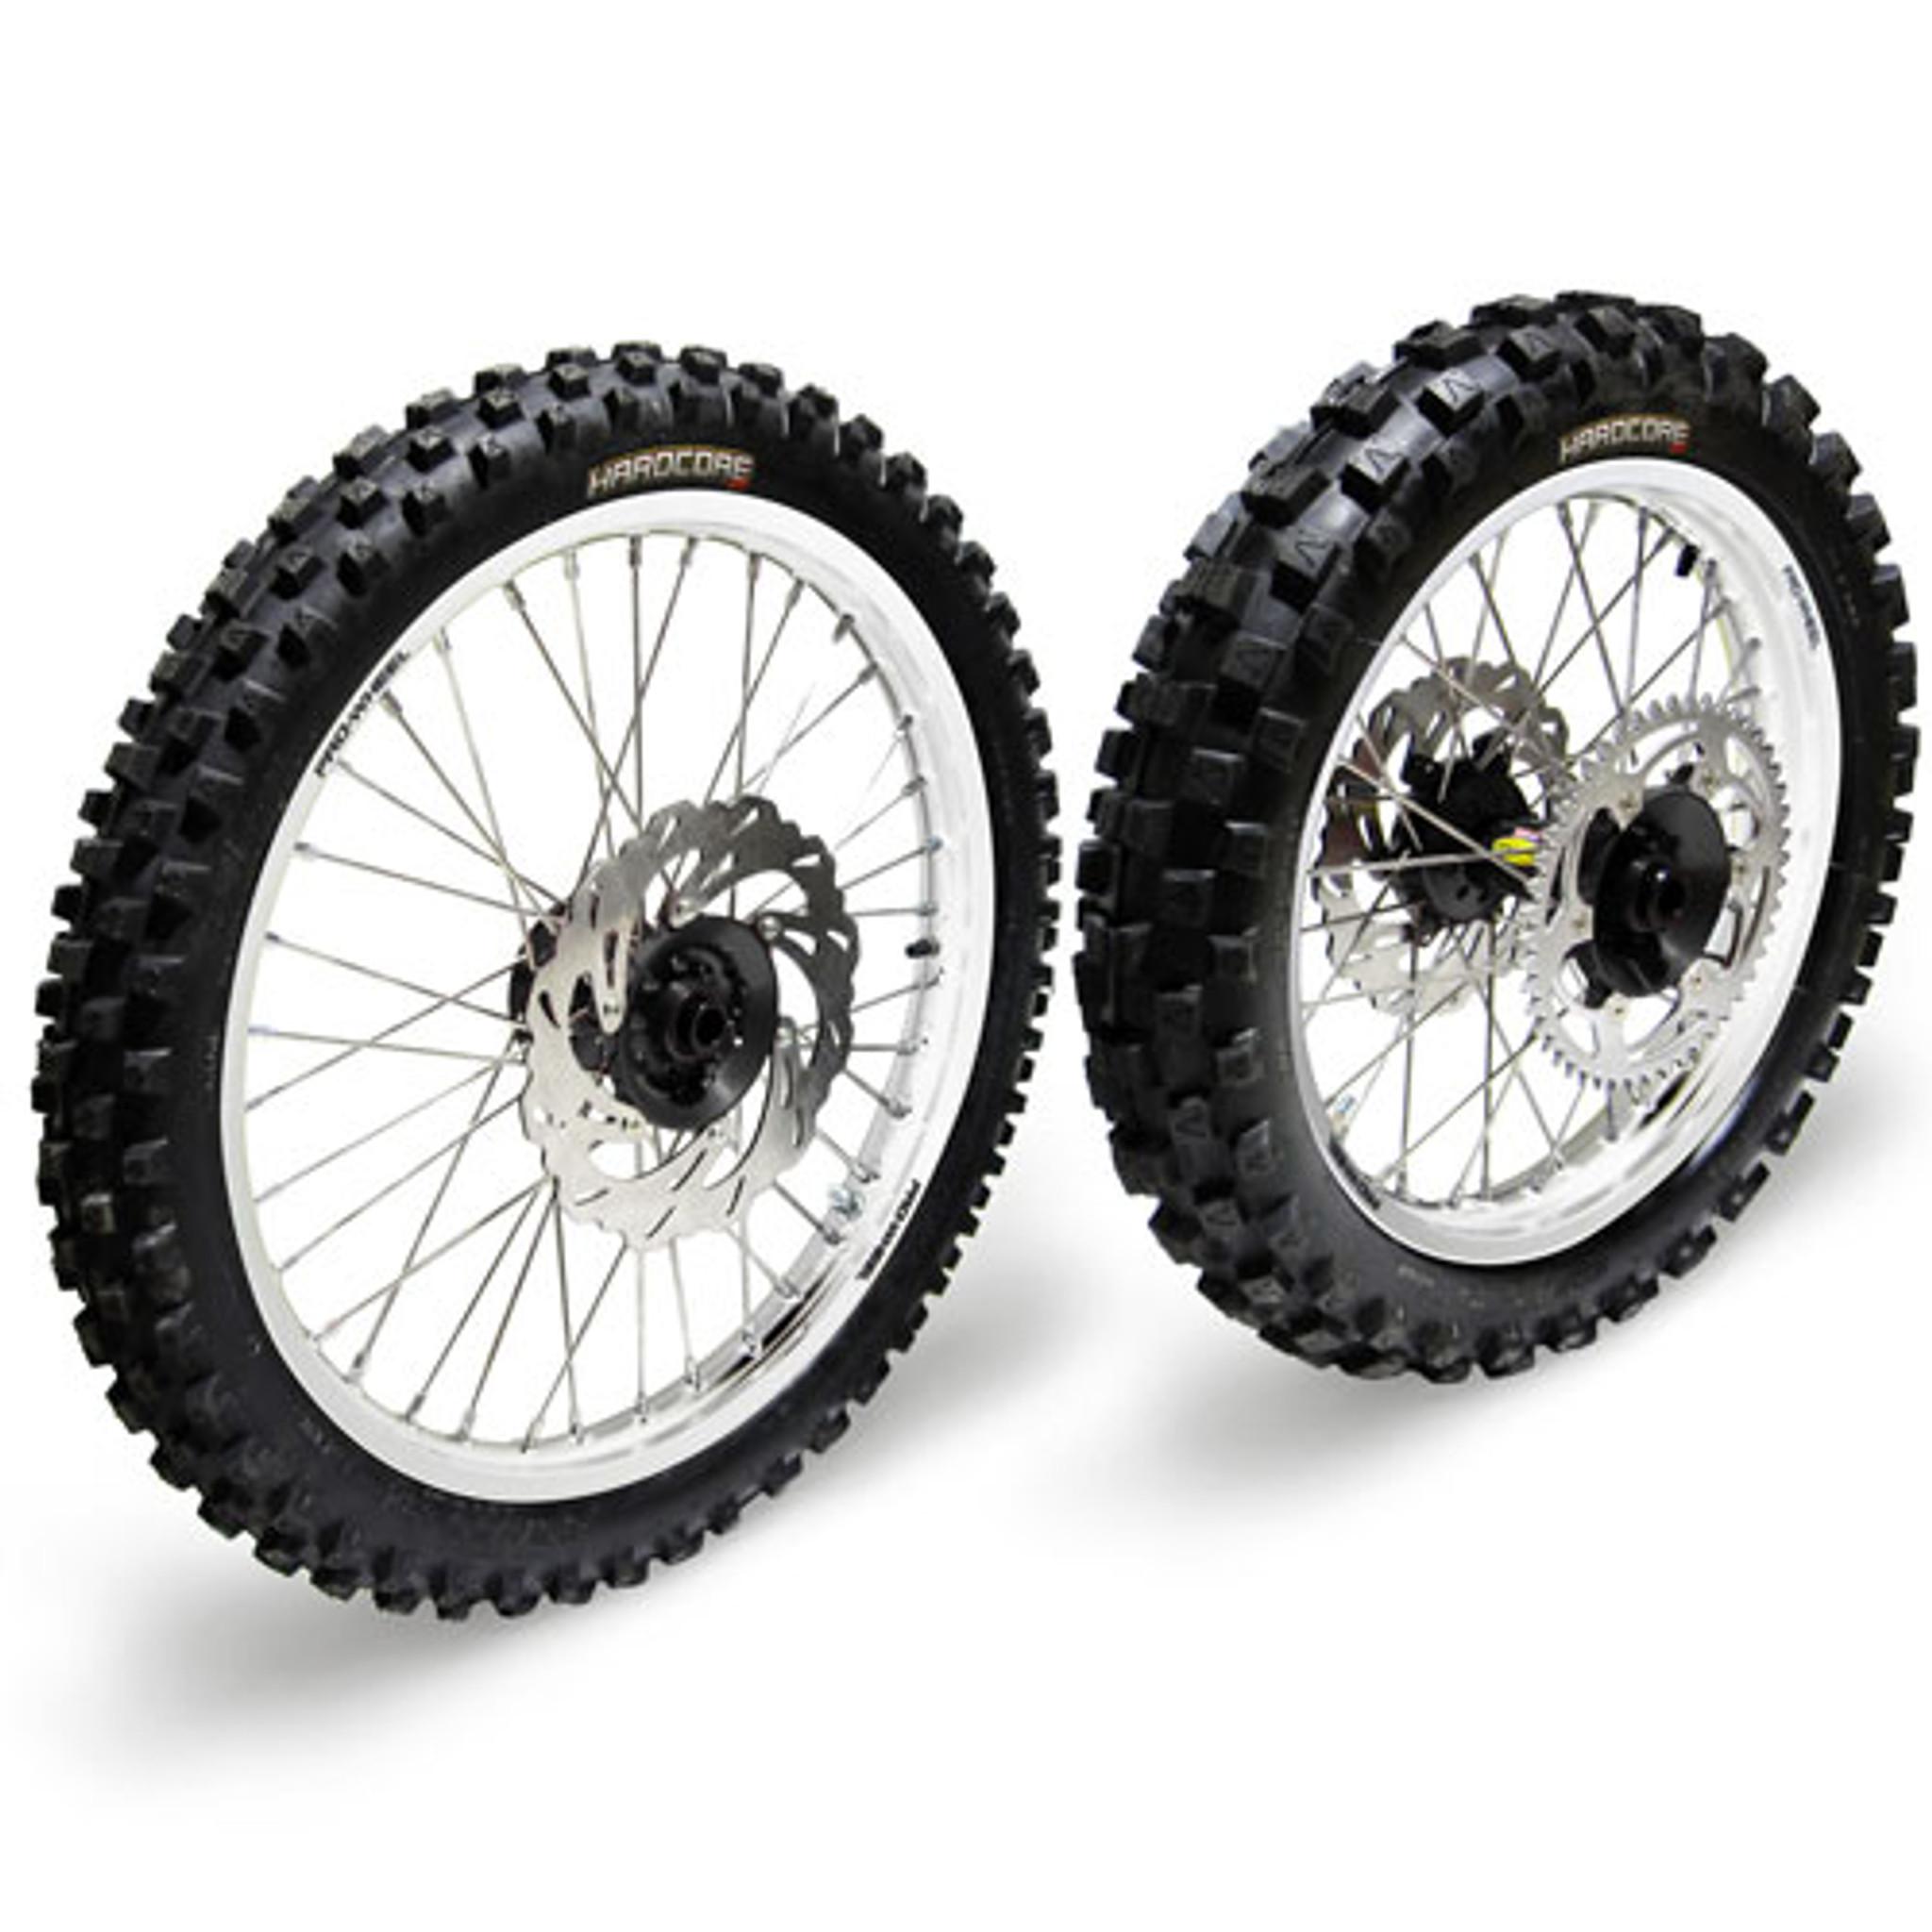 "Pro-Wheel Spoke Kit Front 21/"" for Suzuki Off-Road Motorcycles"